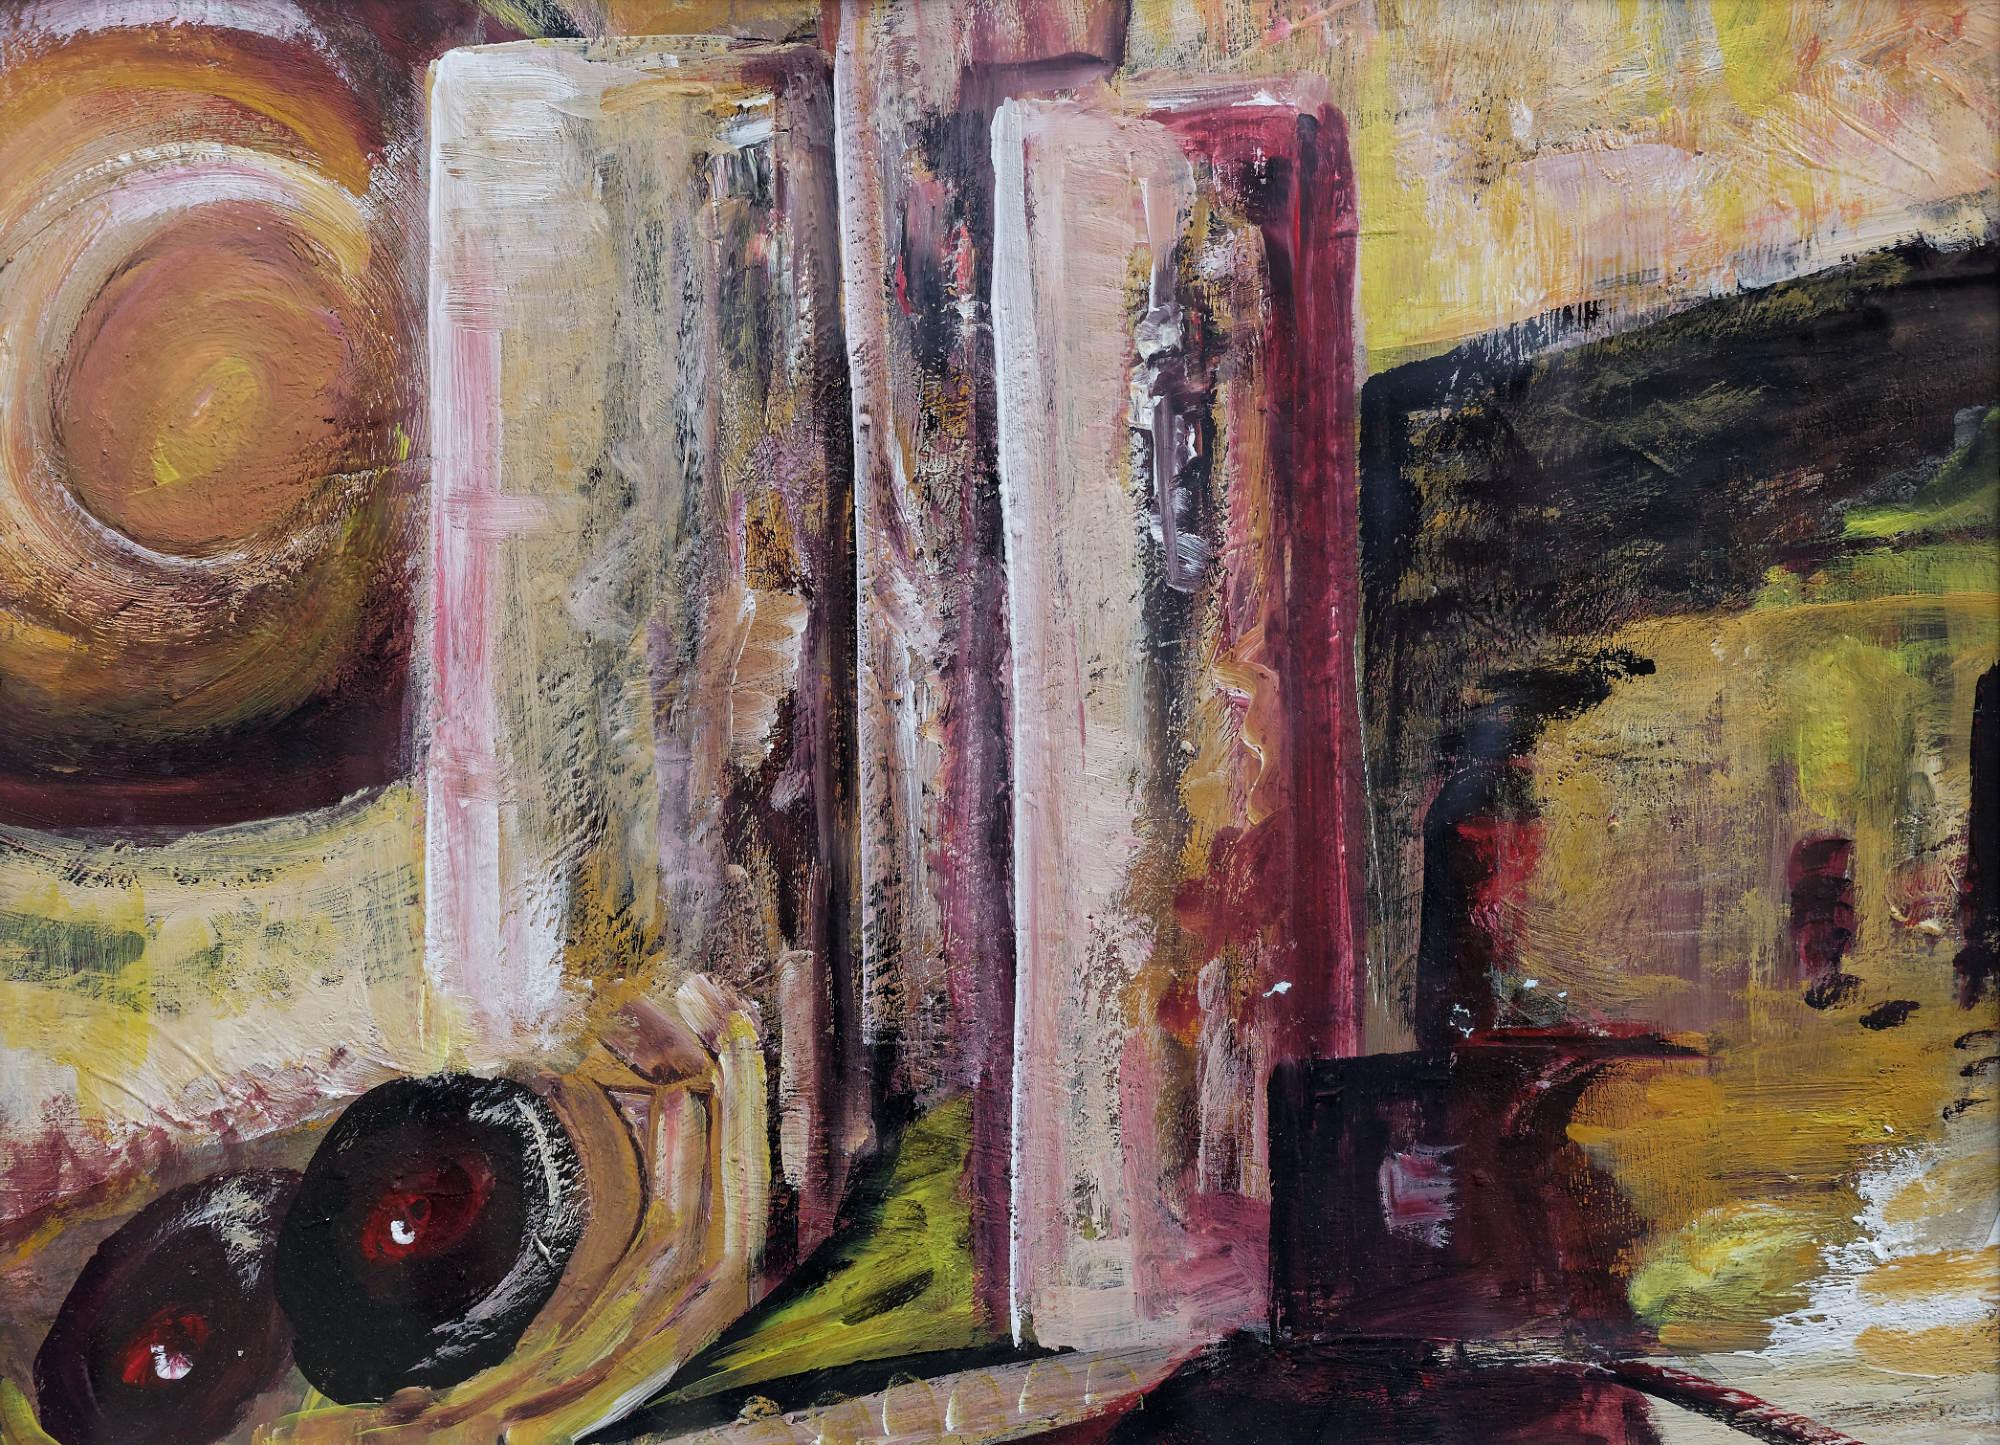 2011 - Drei Säulen, 46x34cm, Acryl